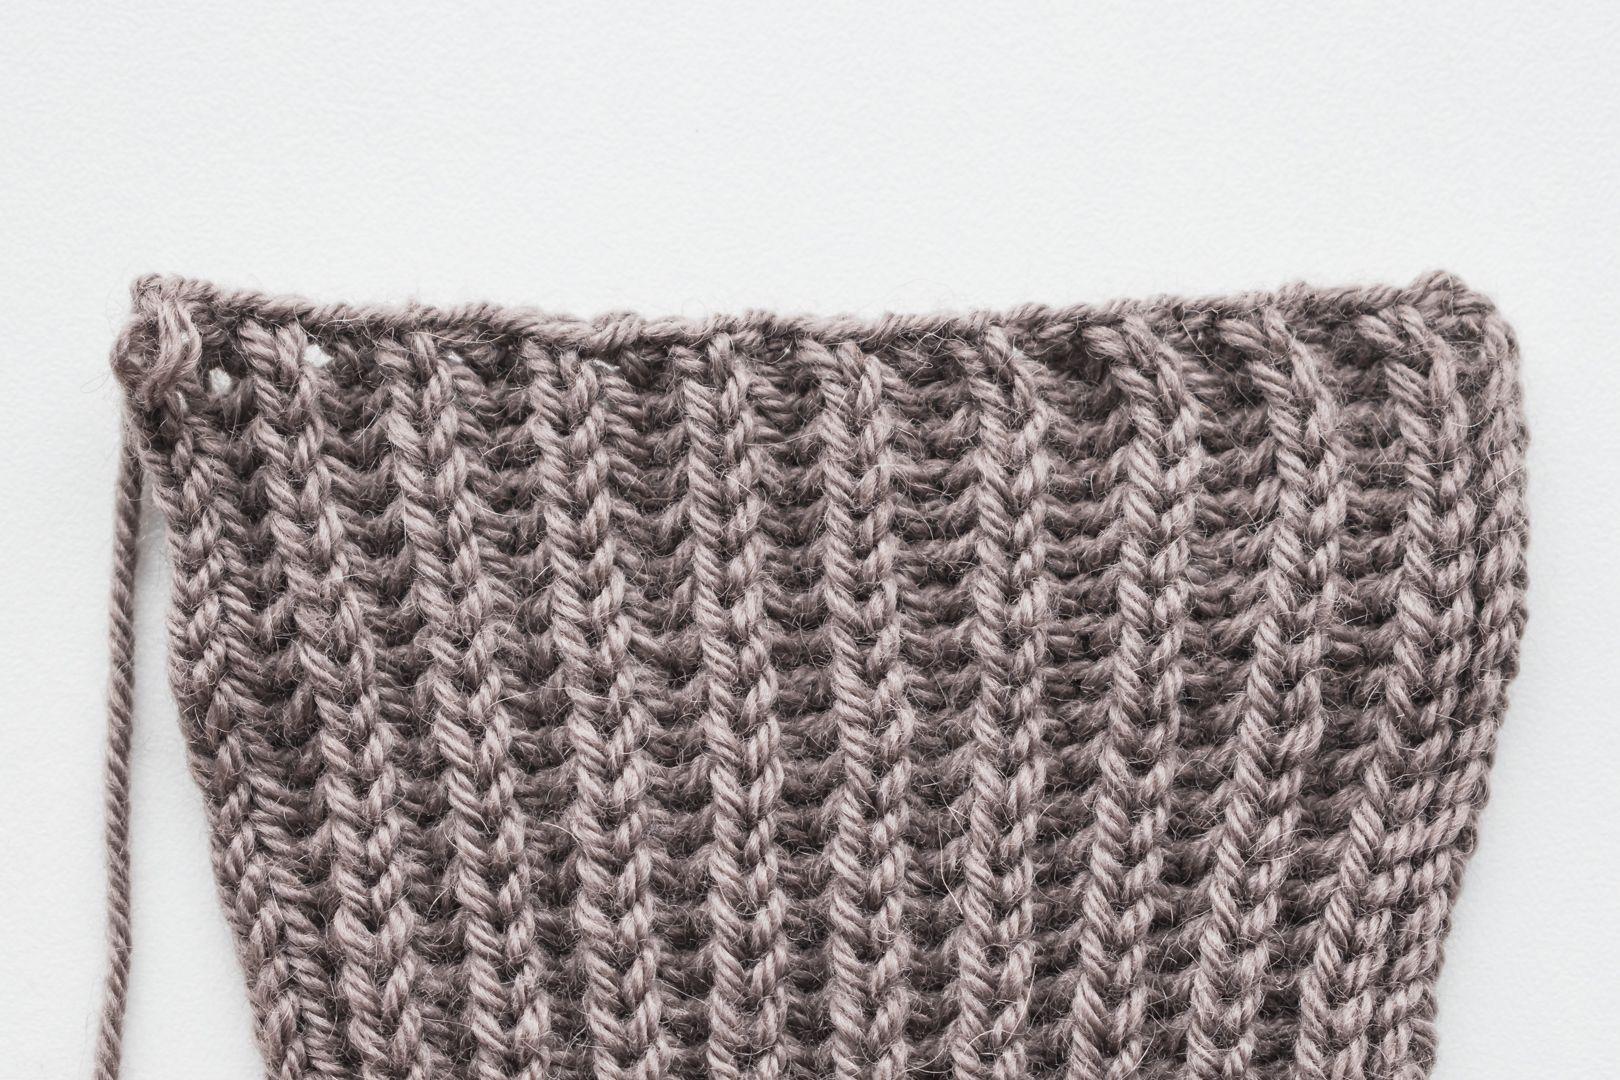 Headband in English rib with a twist | Knit headband ...